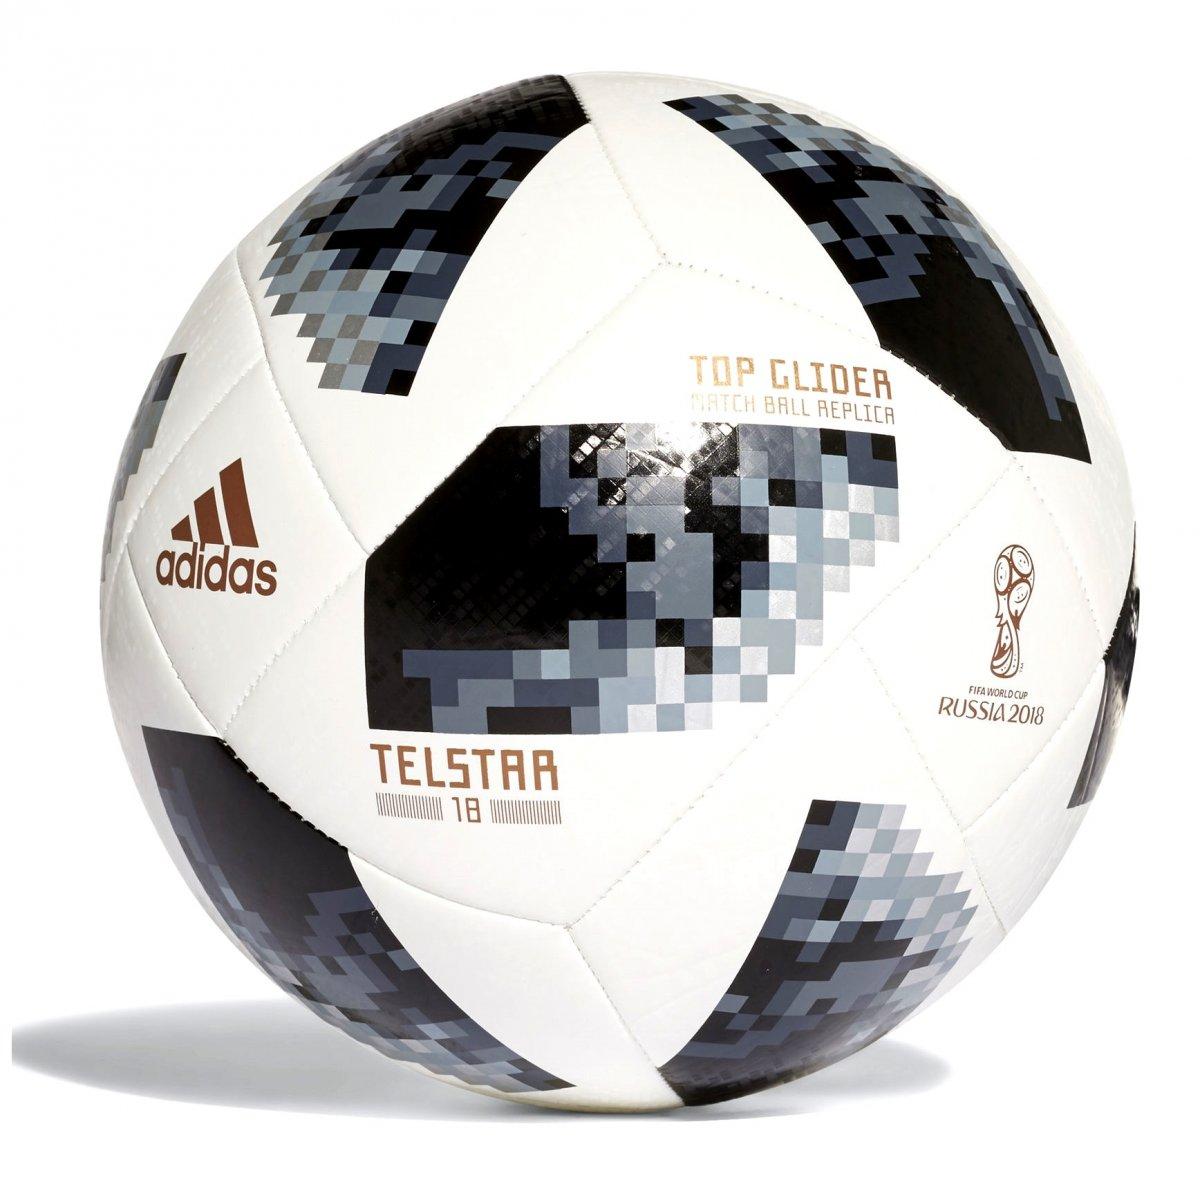 Bola Adidas Top Glider FIFA World Cup 2018 CE8096 2194b3b322f52